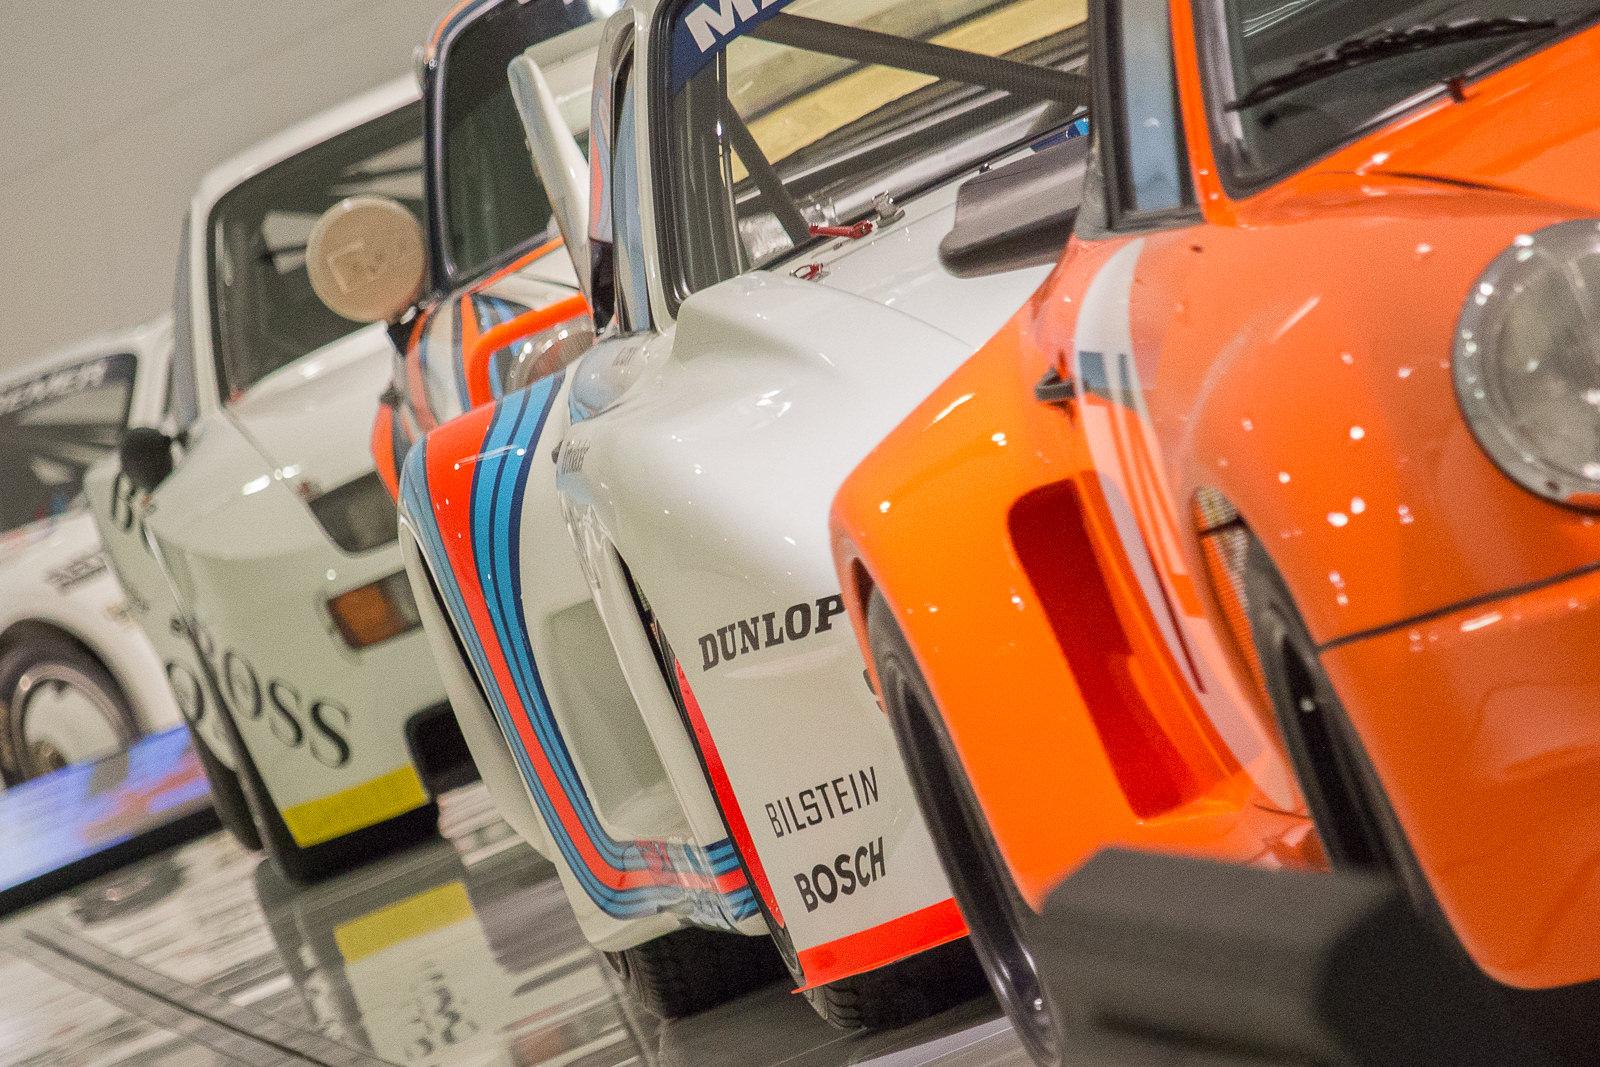 autostadt stuttgart, mercedes, classic cars, oldtimer, vintage cars, solitude revival, autorennen, porsche, porsche museum, mercedes, mercedes-benz museum,